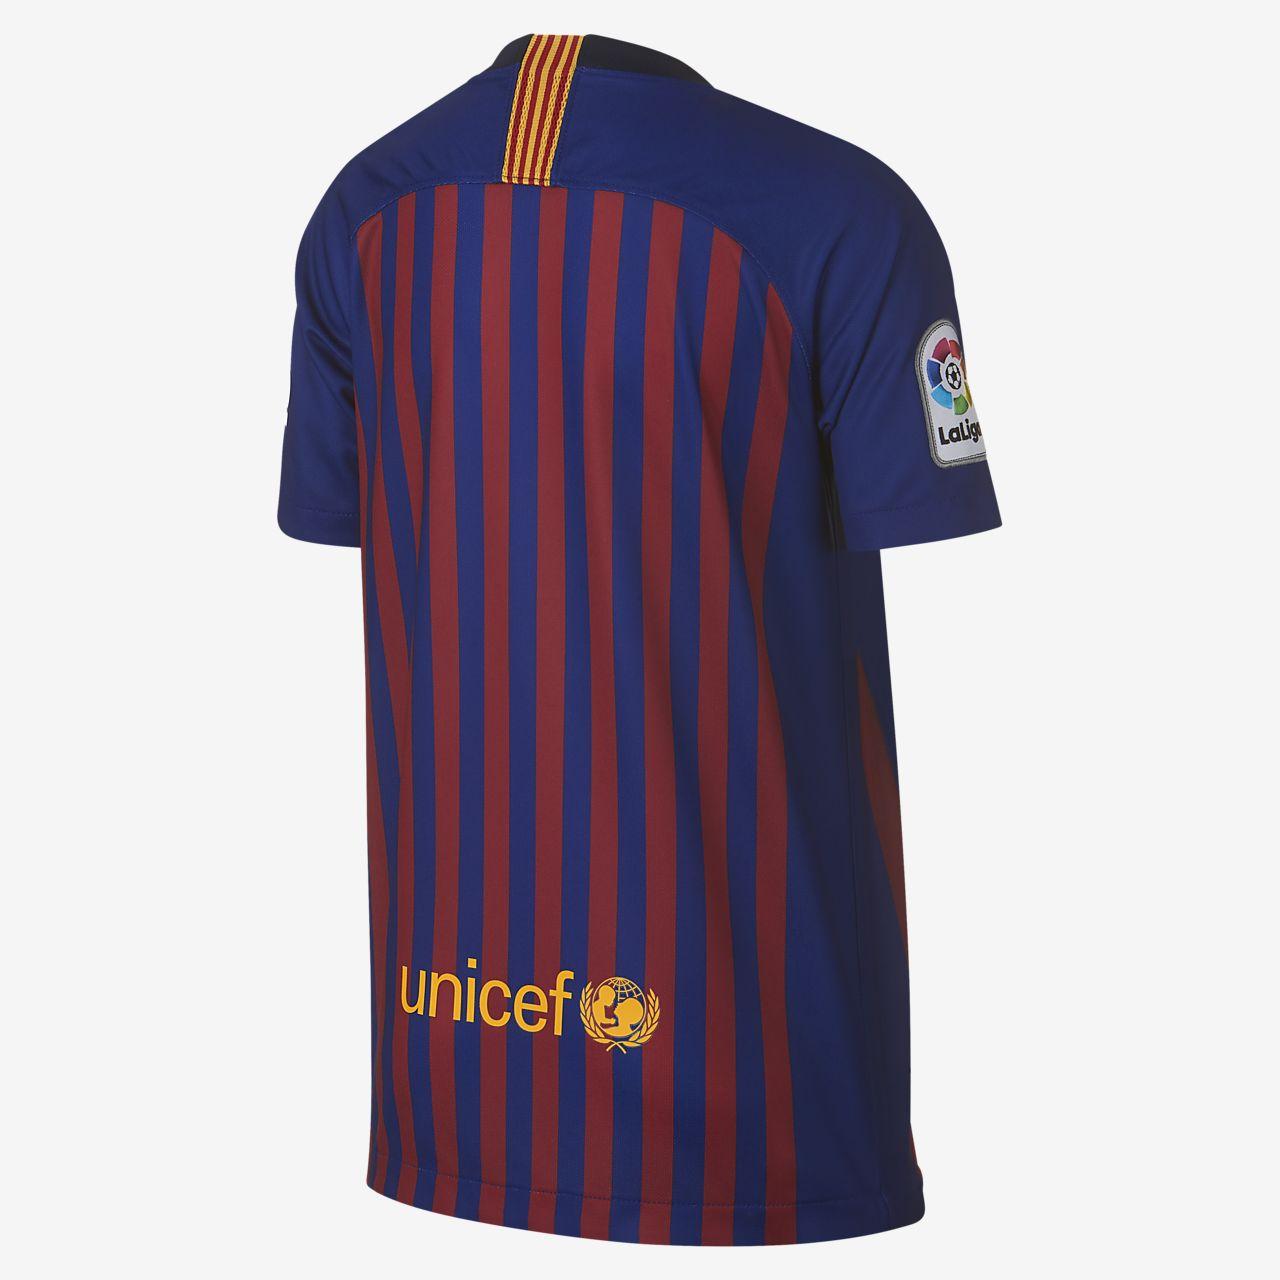 dbaf307cb 2018 19 FC Barcelona Stadium Home Big Kids  Soccer Jersey. Nike.com